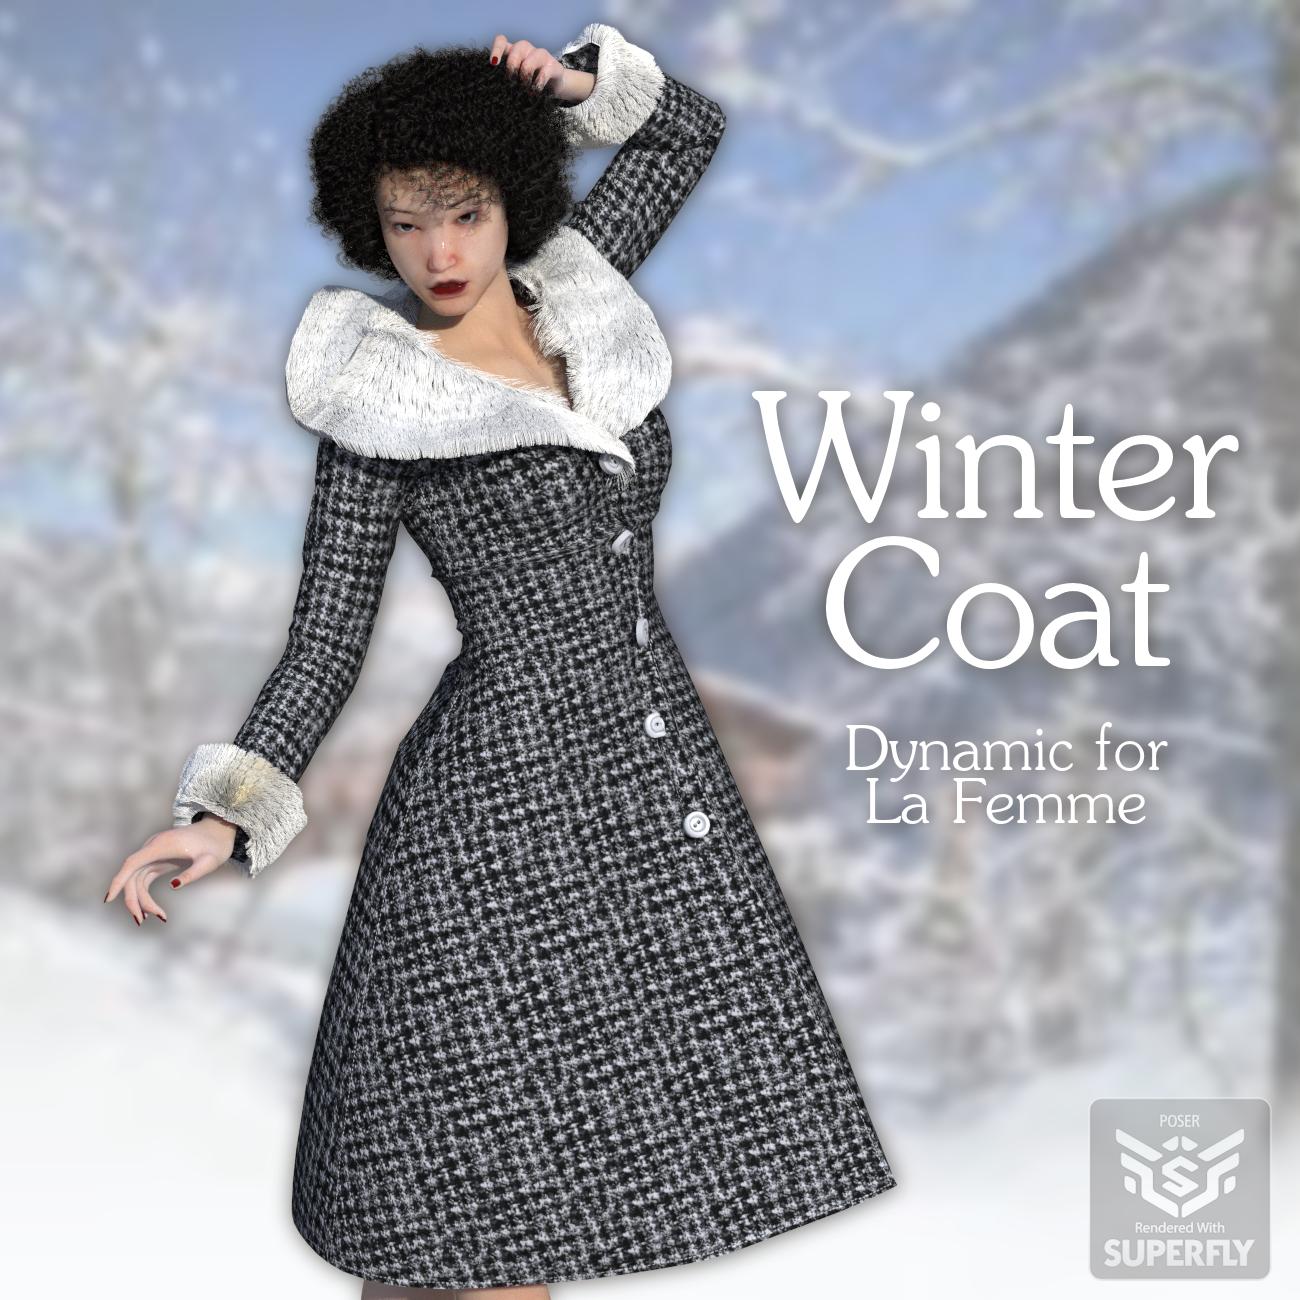 Wintercoat promotete